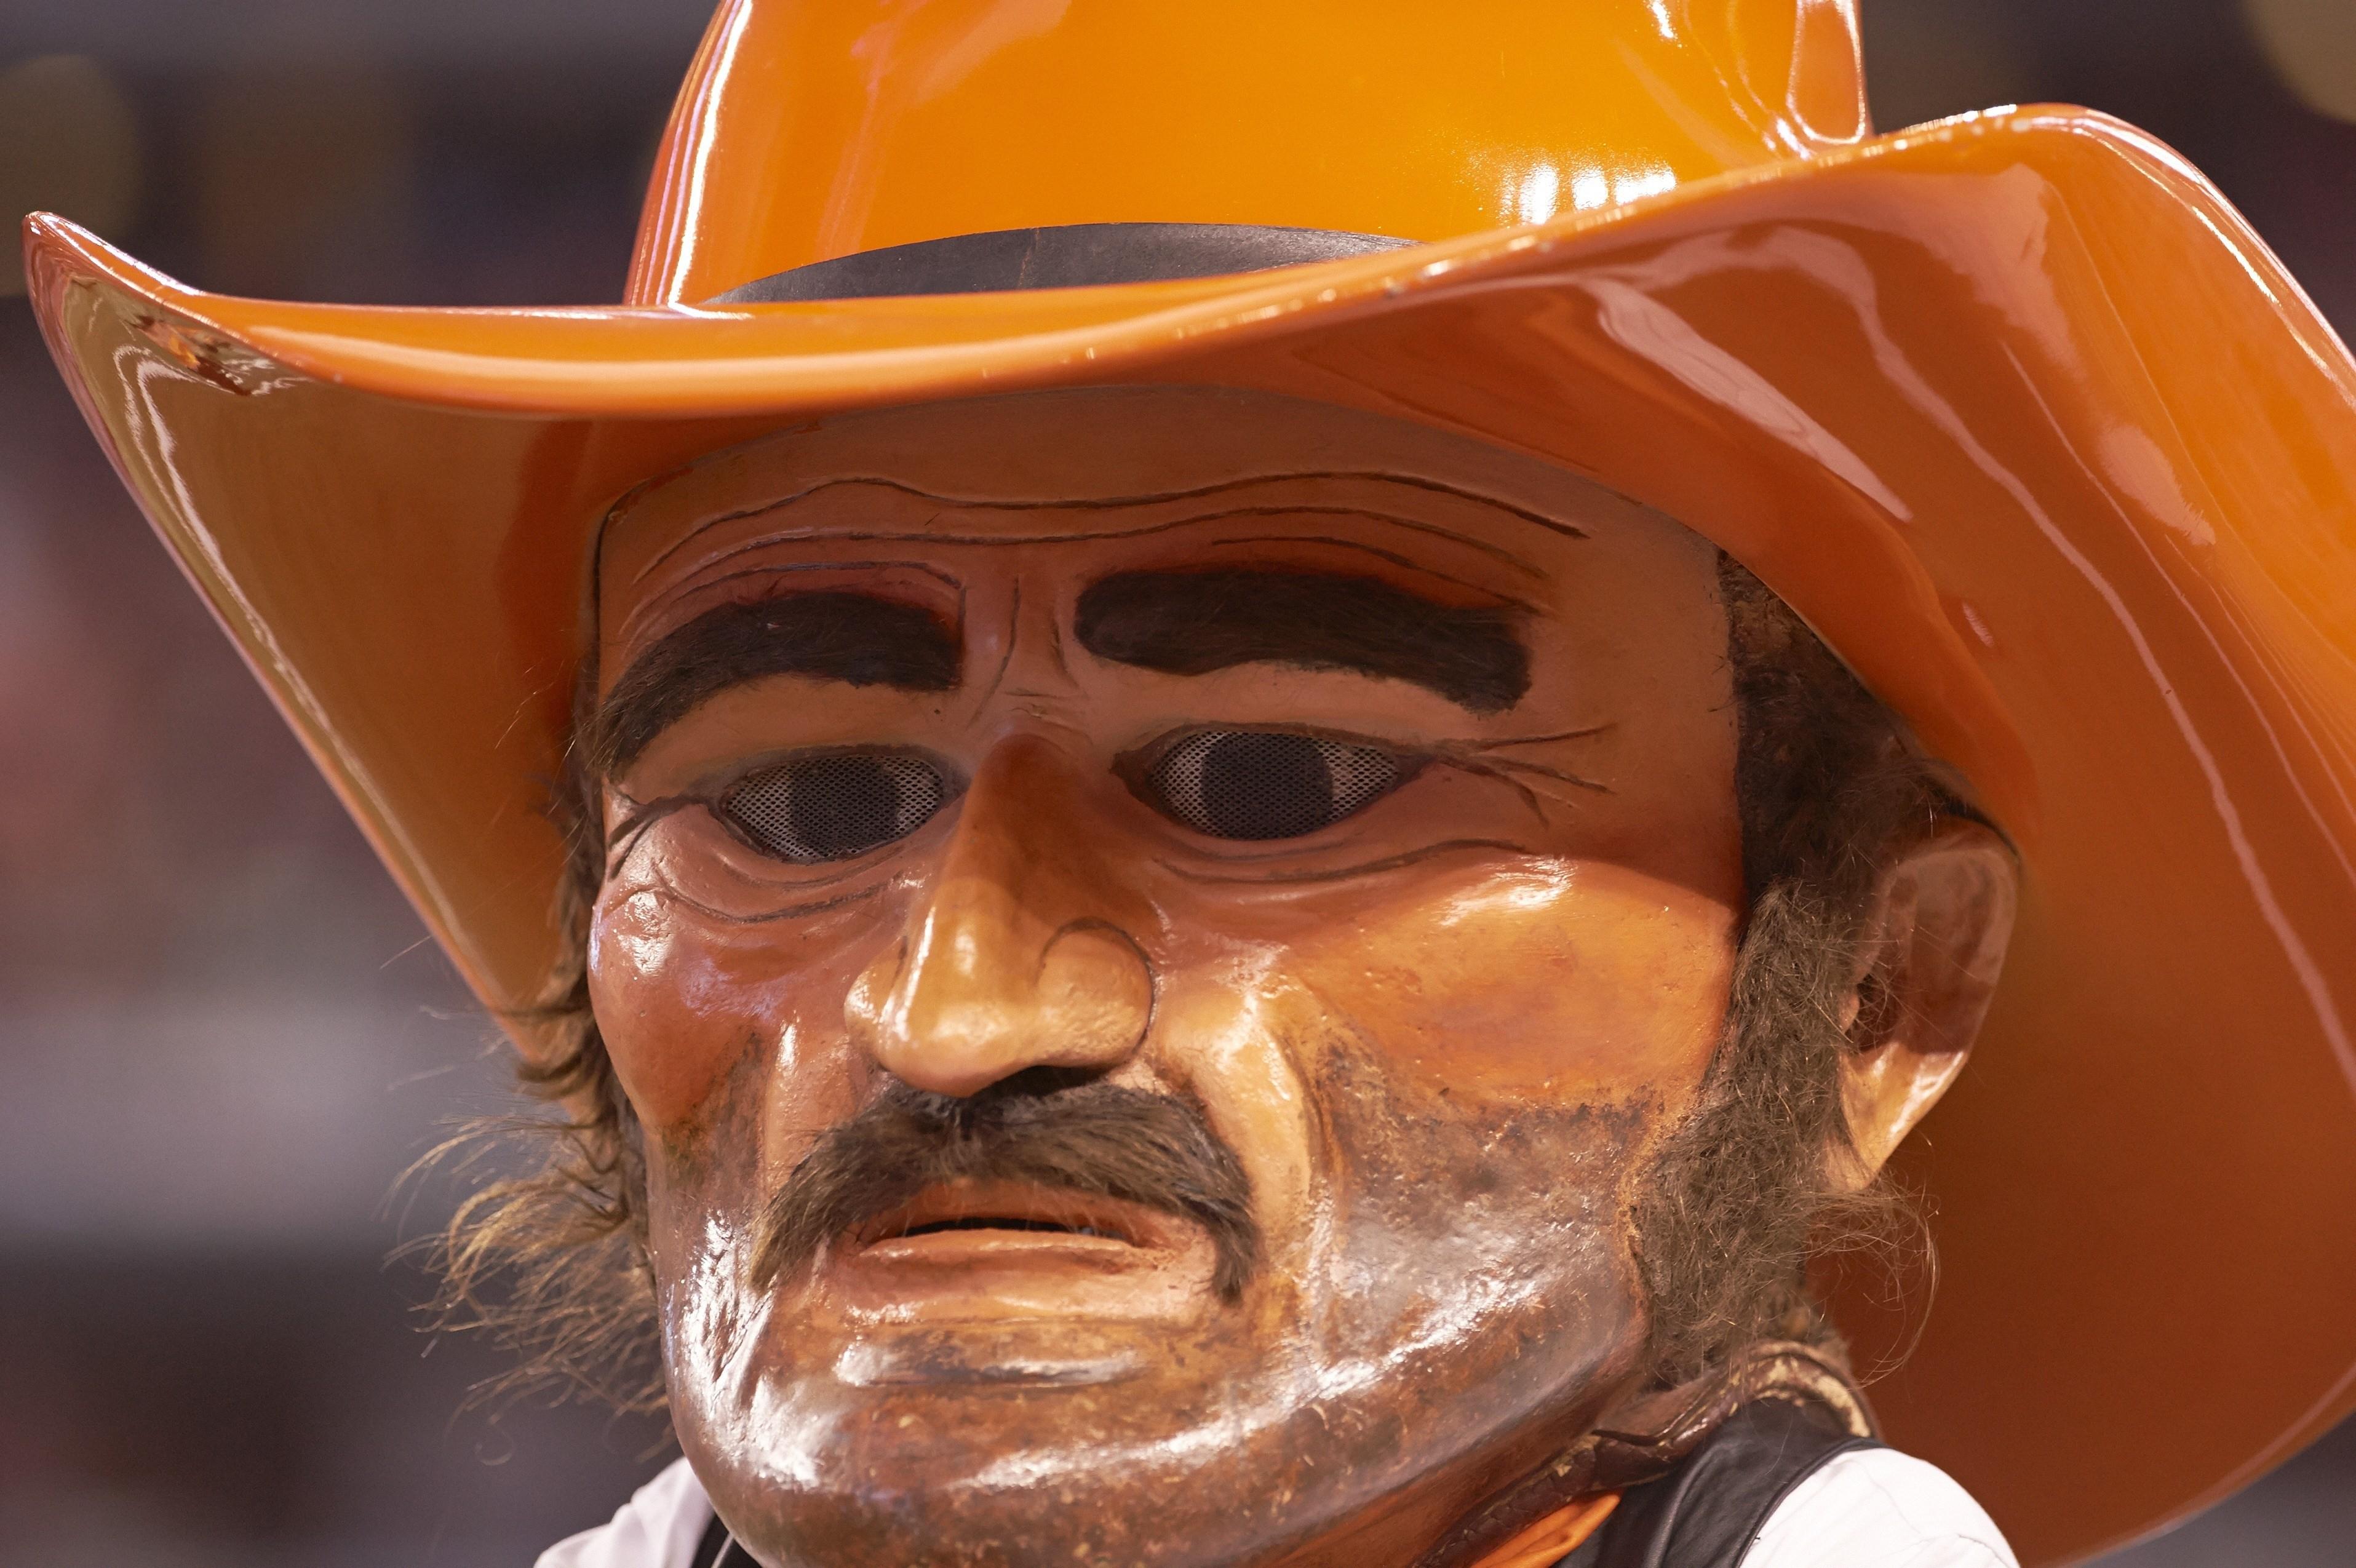 Florida State University vs Oklahoma State University, 2014 AdvoCare Cowboys Classic